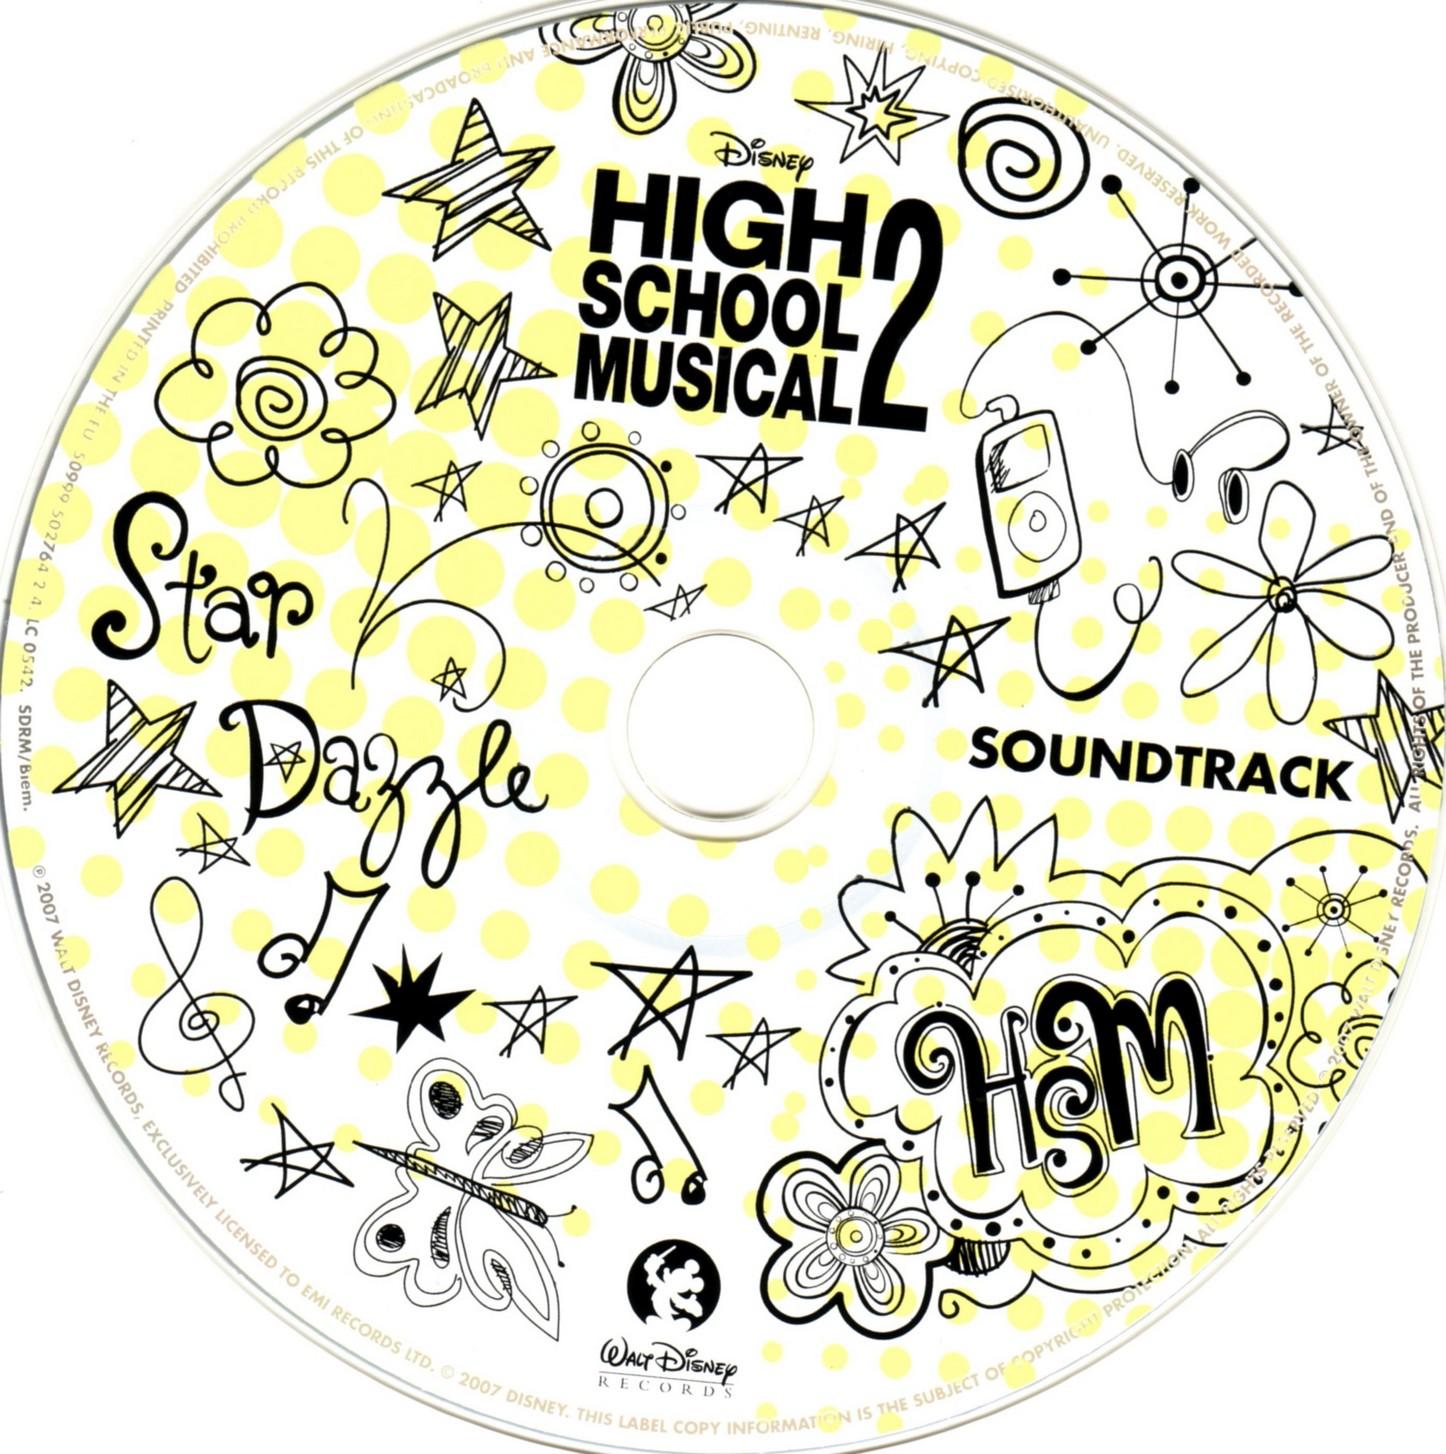 High School Musical 1 Soundtrack Download Torrent